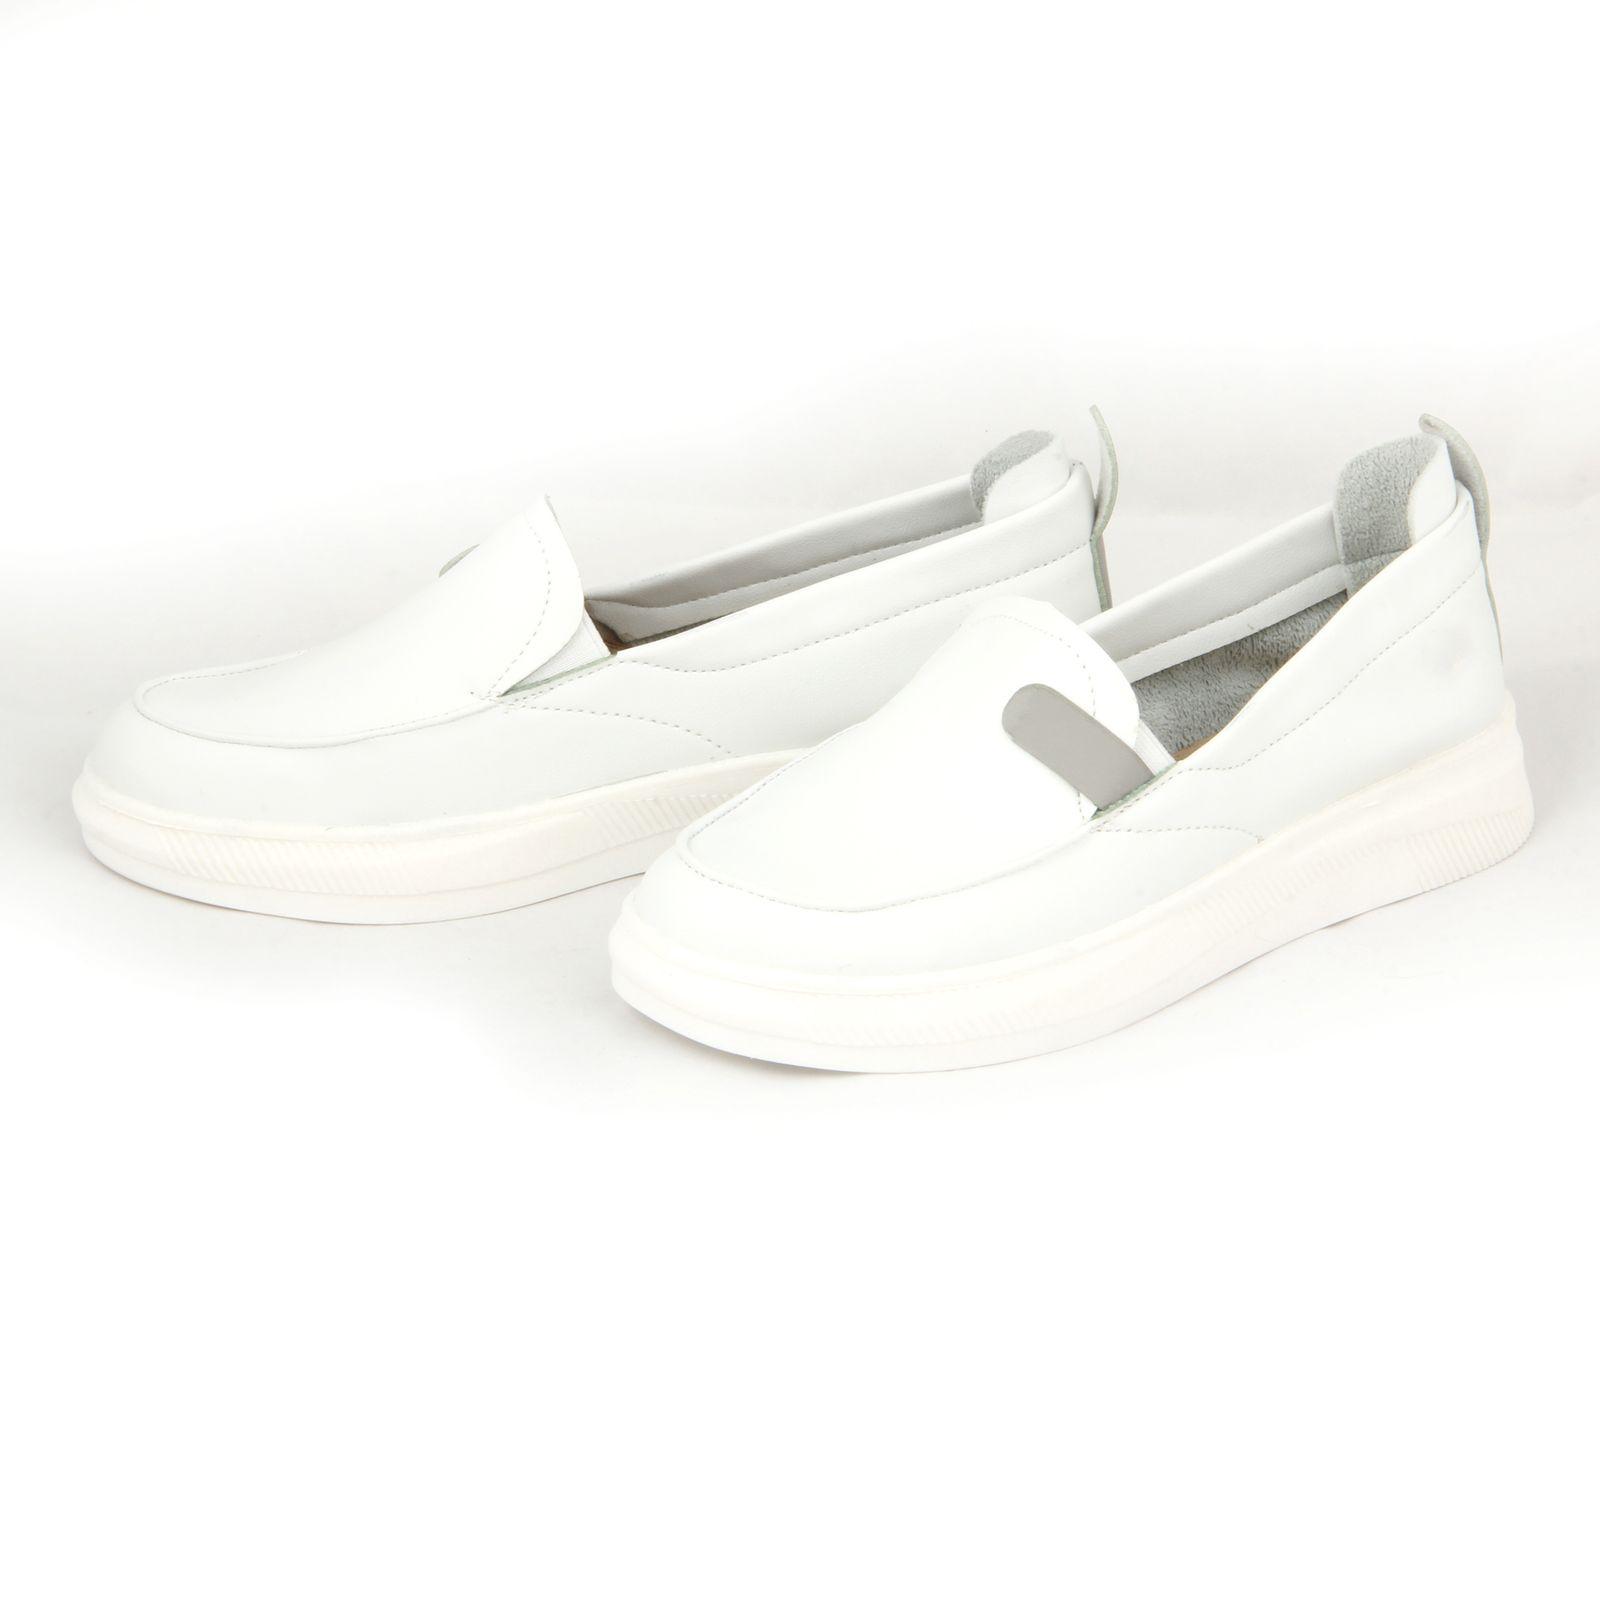 کفش روزمره زنانه کد 479 -  - 4